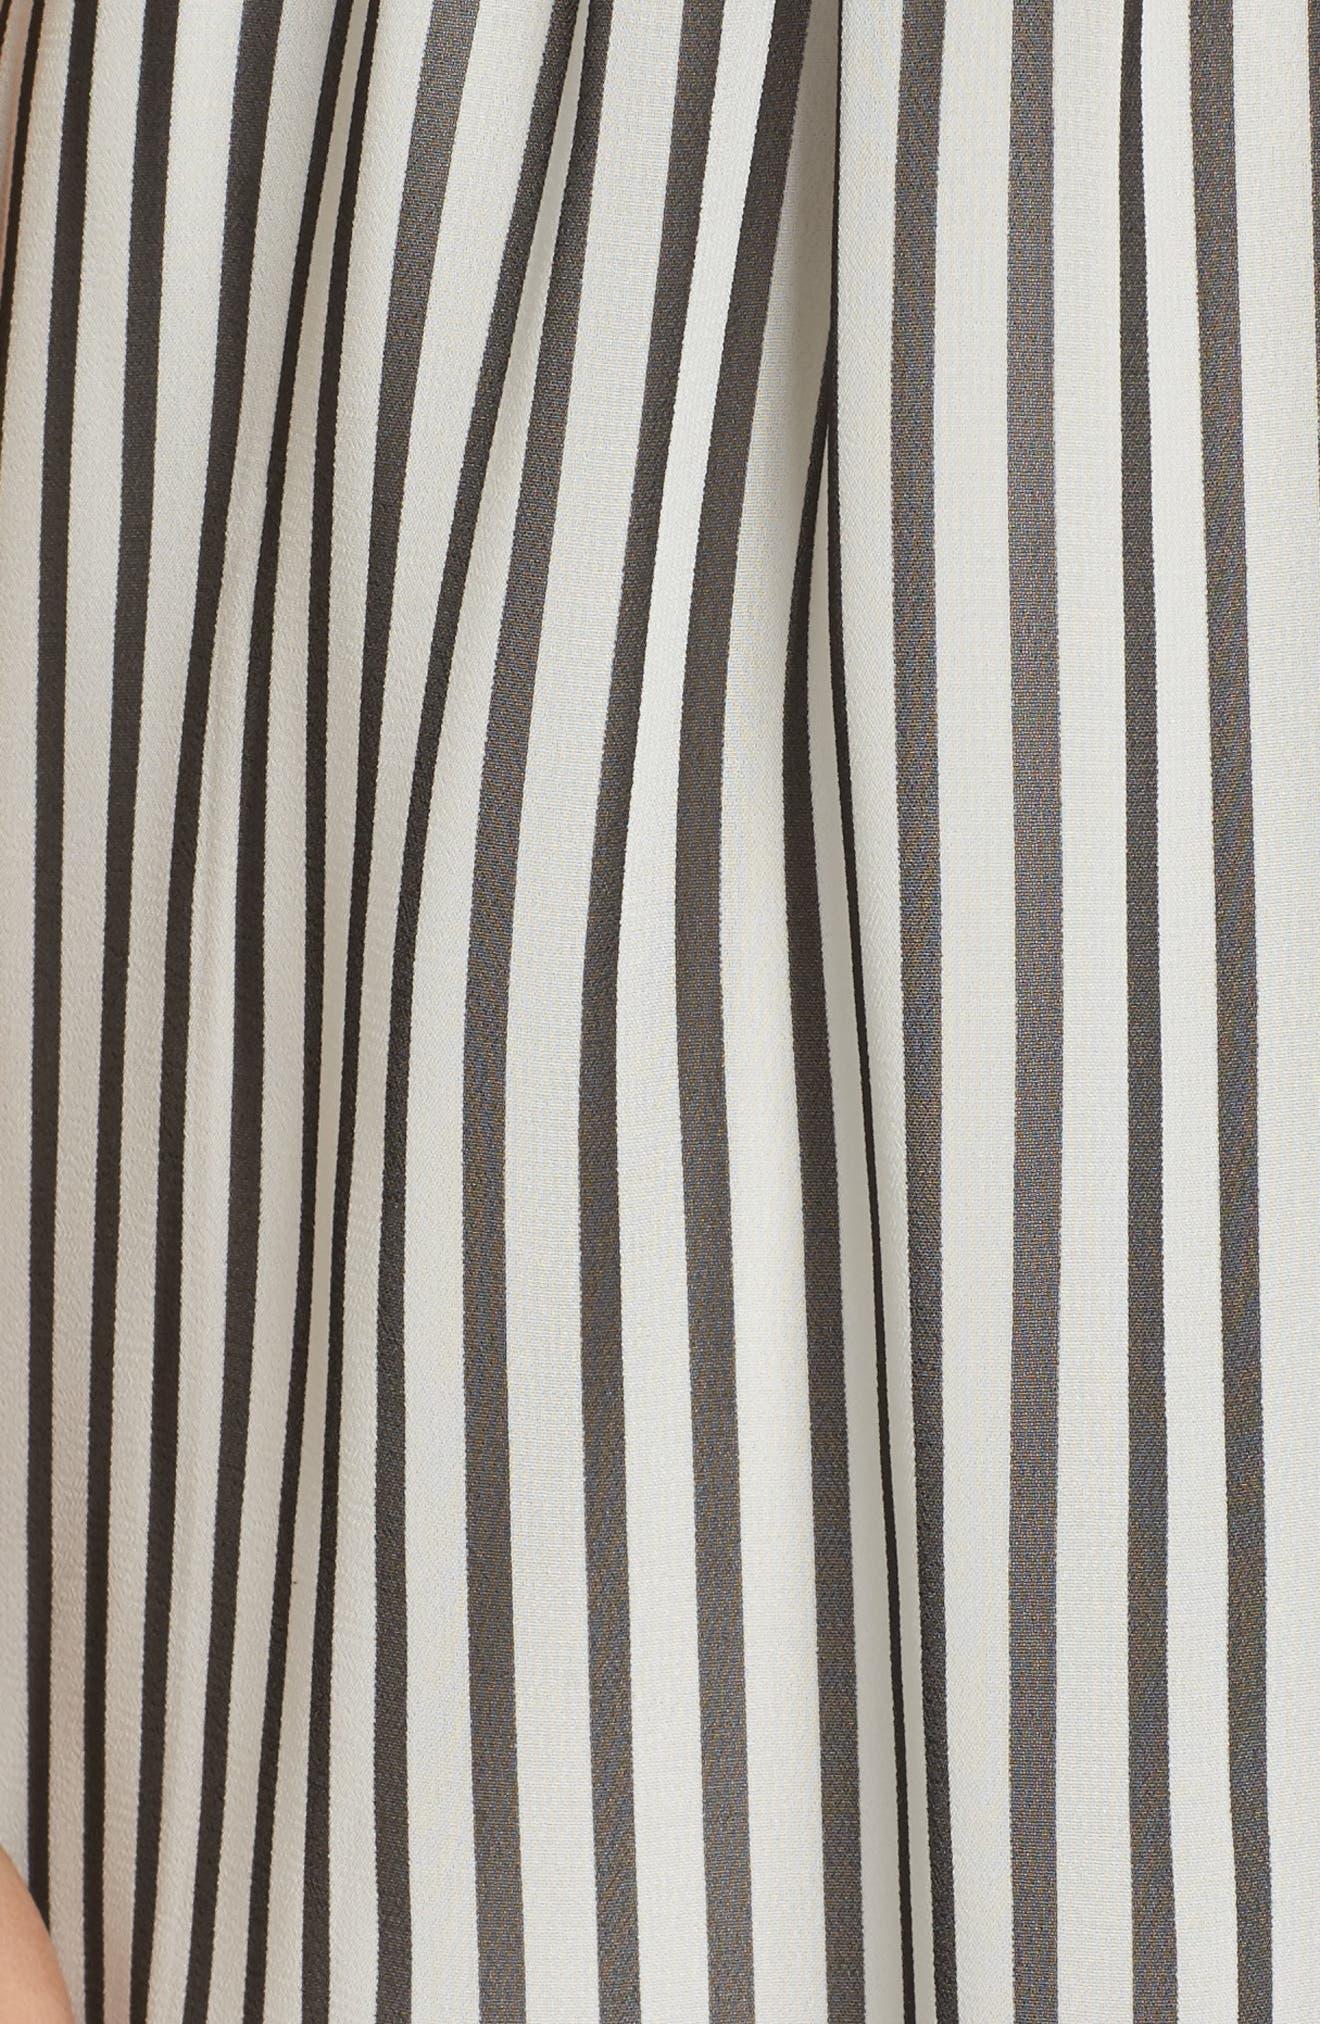 Toes in the Sand Romper,                             Alternate thumbnail 6, color,                             Black/ White Stripe